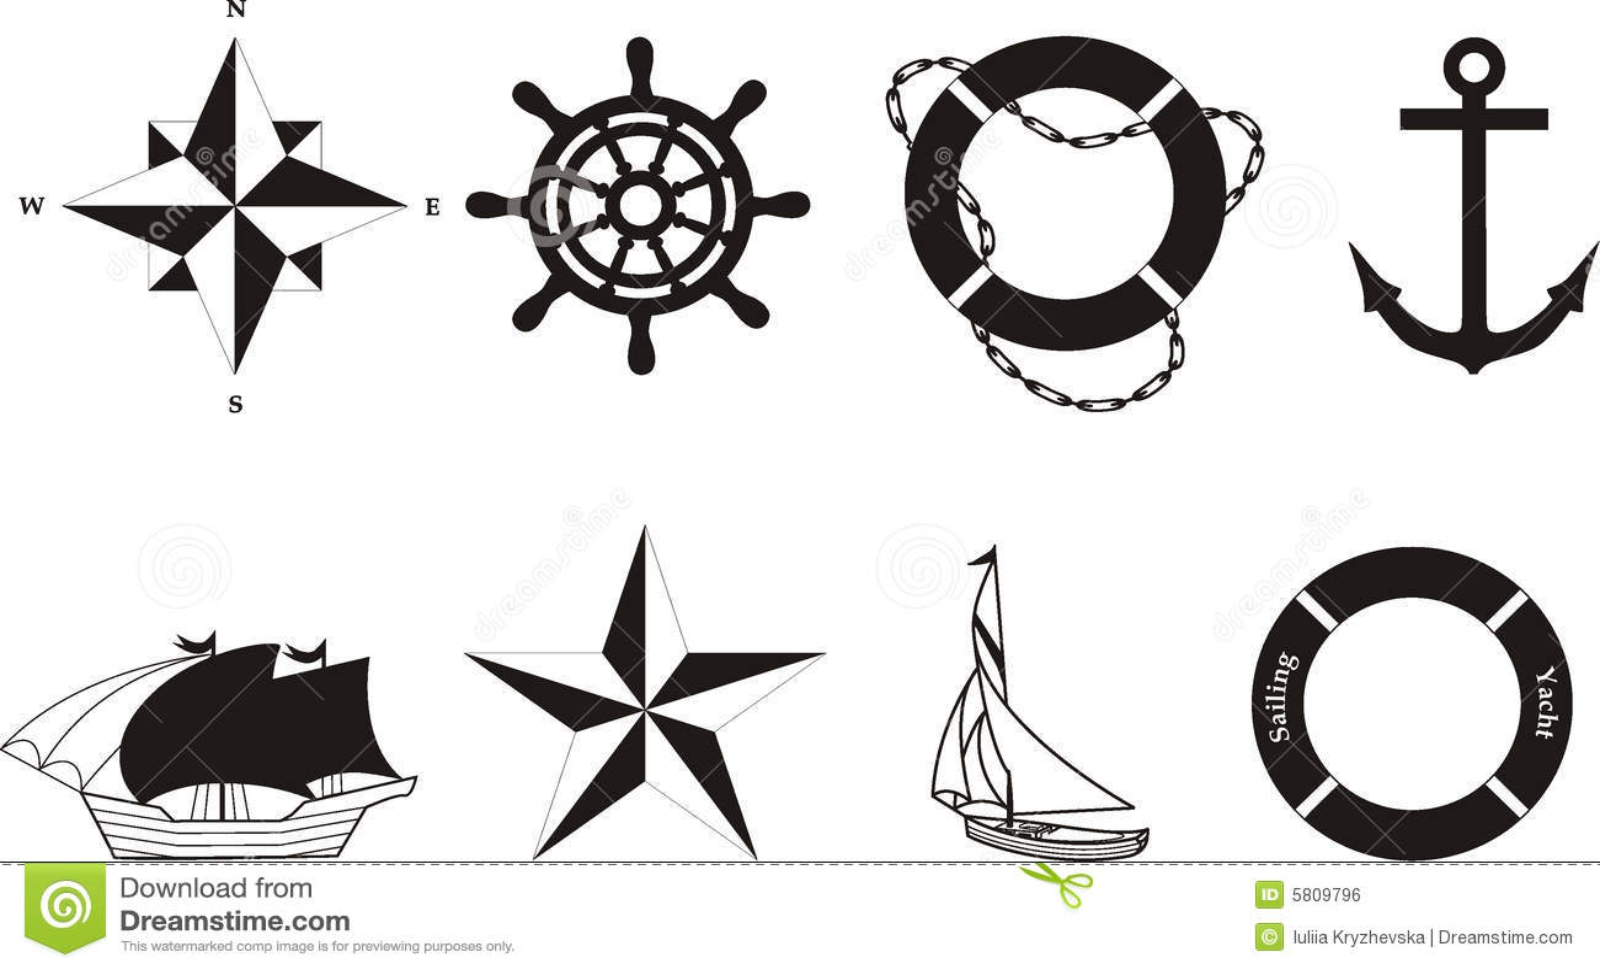 Nautical Vector Amp Rasterized Symbols Royalty Free Stock